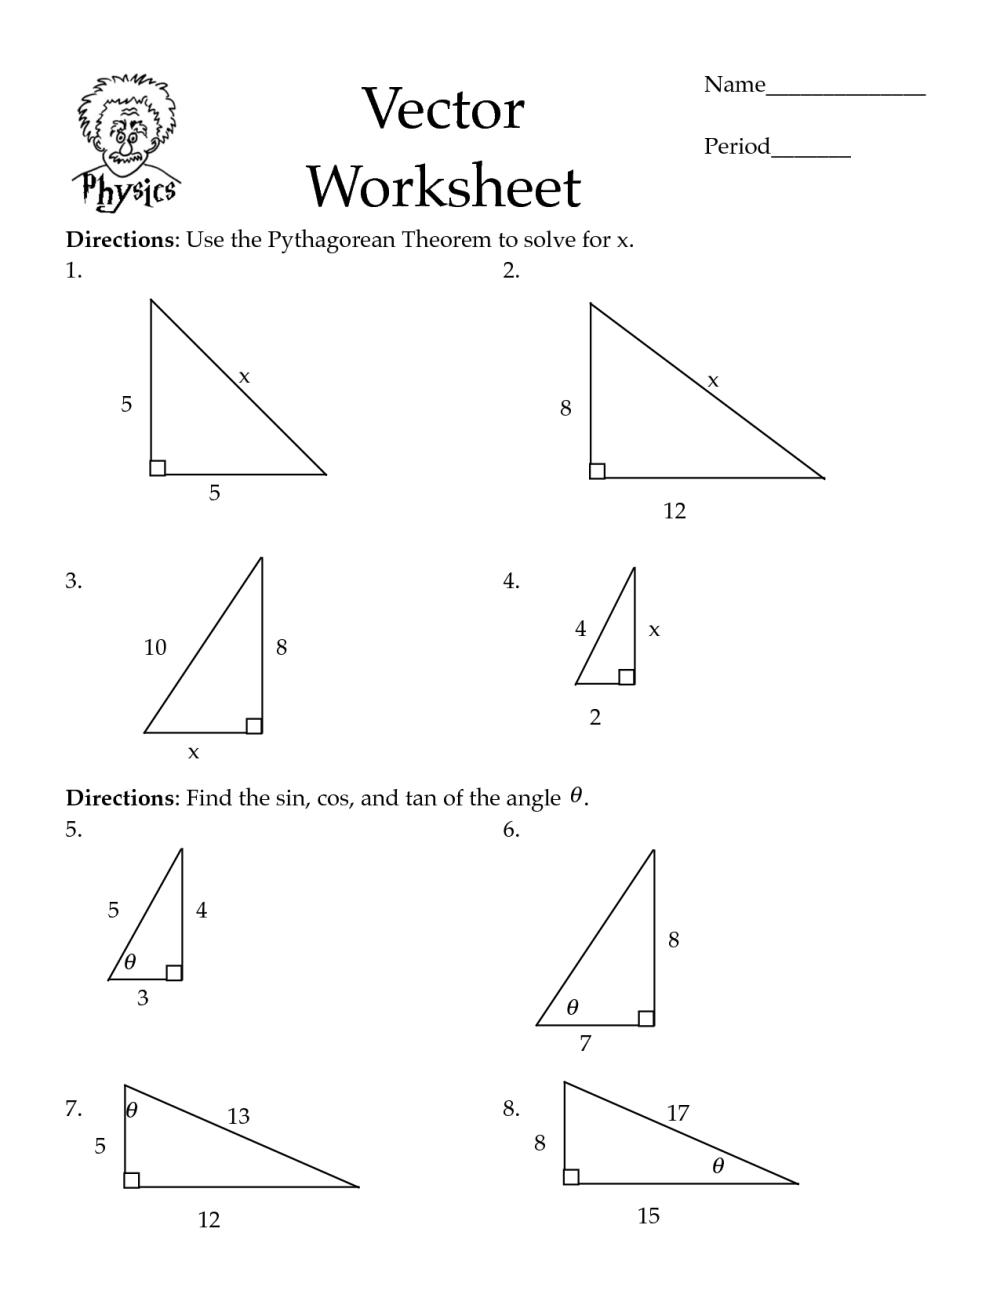 medium resolution of 31 The Pythagorean Theorem Worksheet - Free Worksheet Spreadsheet